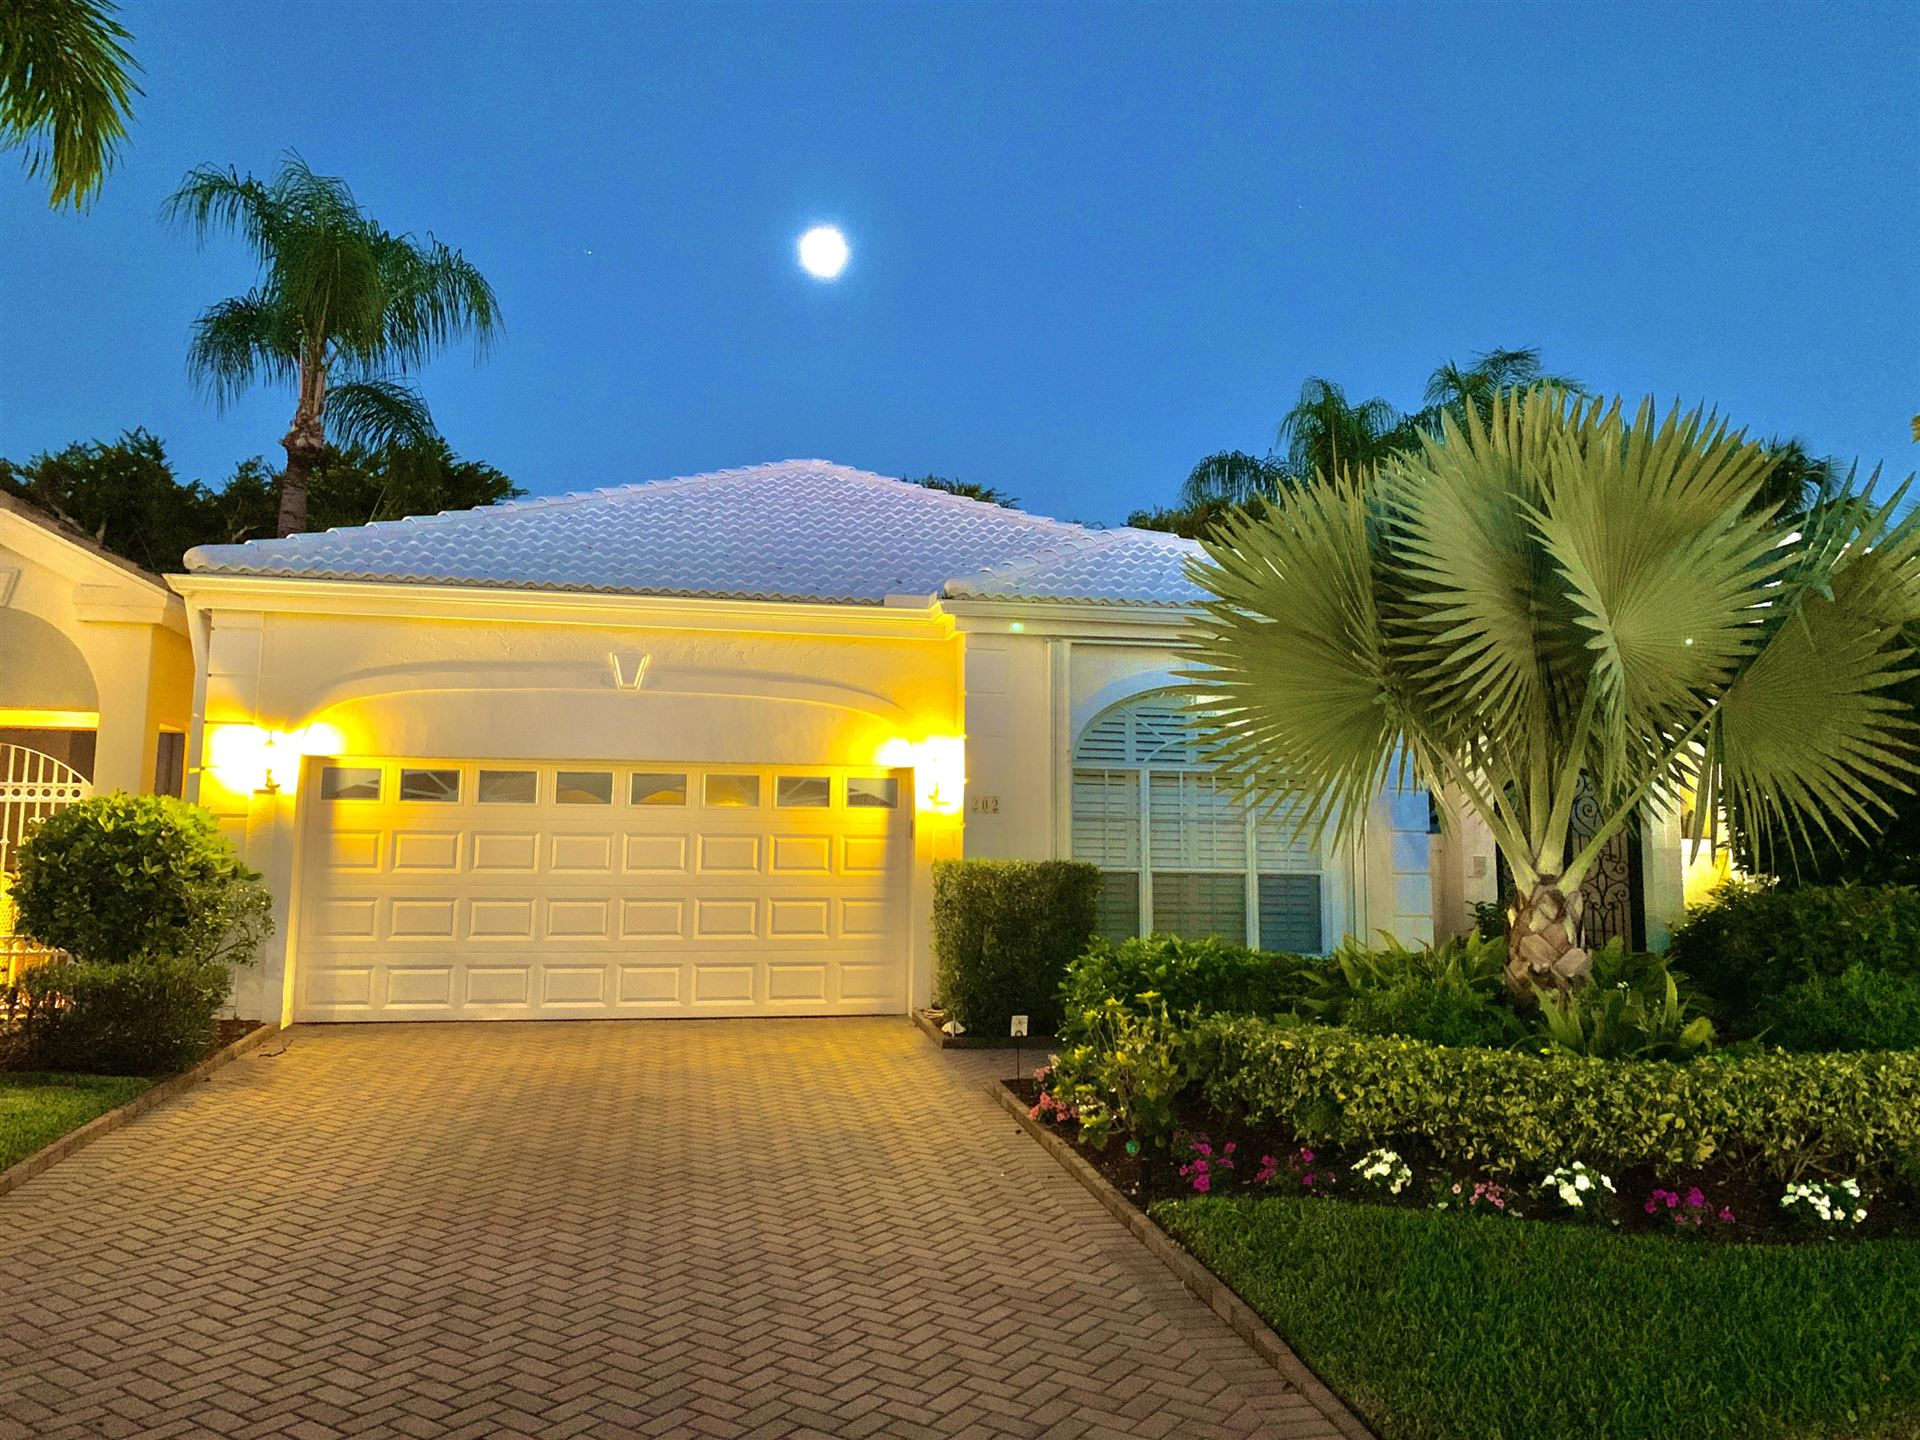 Photo of 202 Coral Cay Terrace, Palm Beach Gardens, FL 33418 (MLS # RX-10693566)